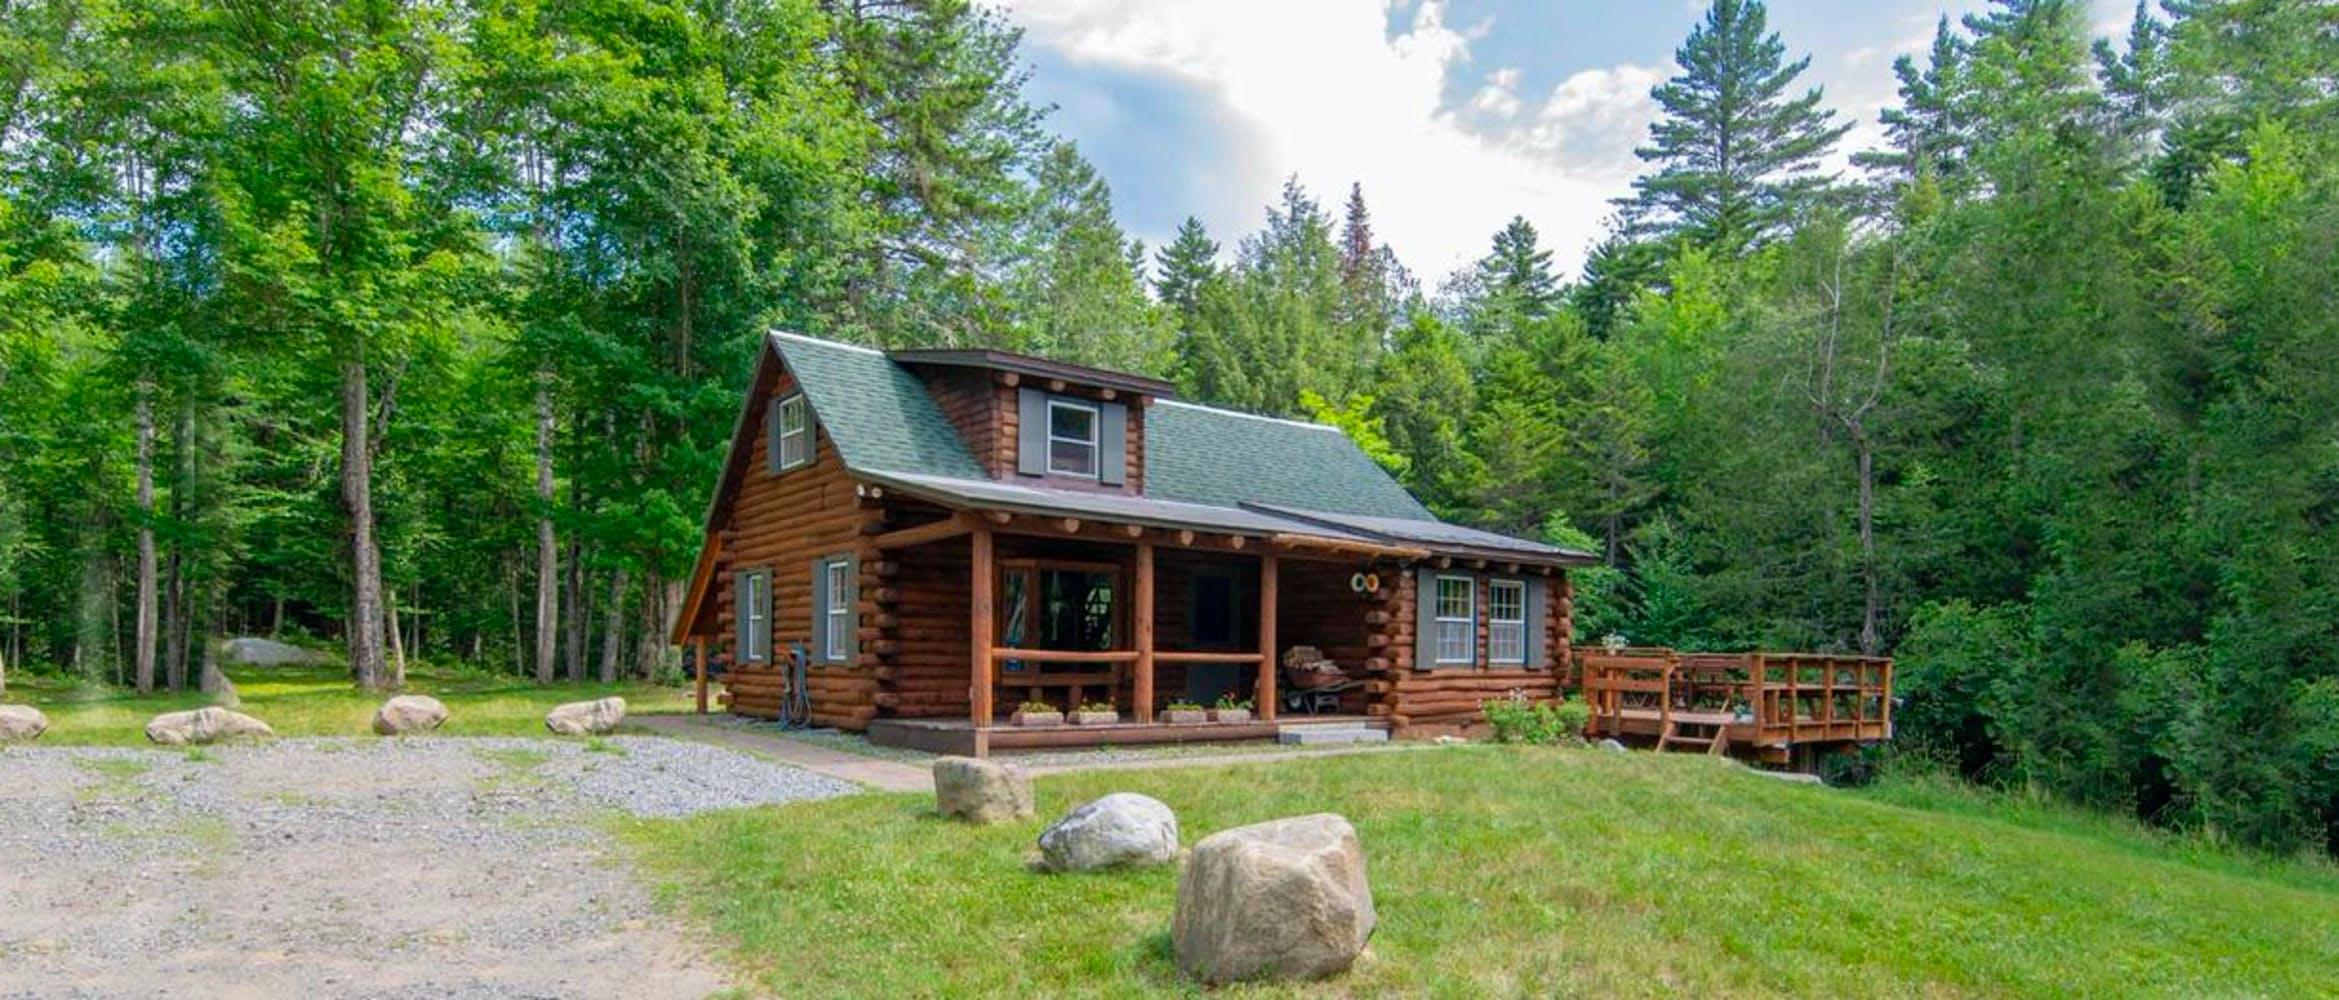 Sneak Away to This Rustic Adirondack Mountain Cabin   Huckberry